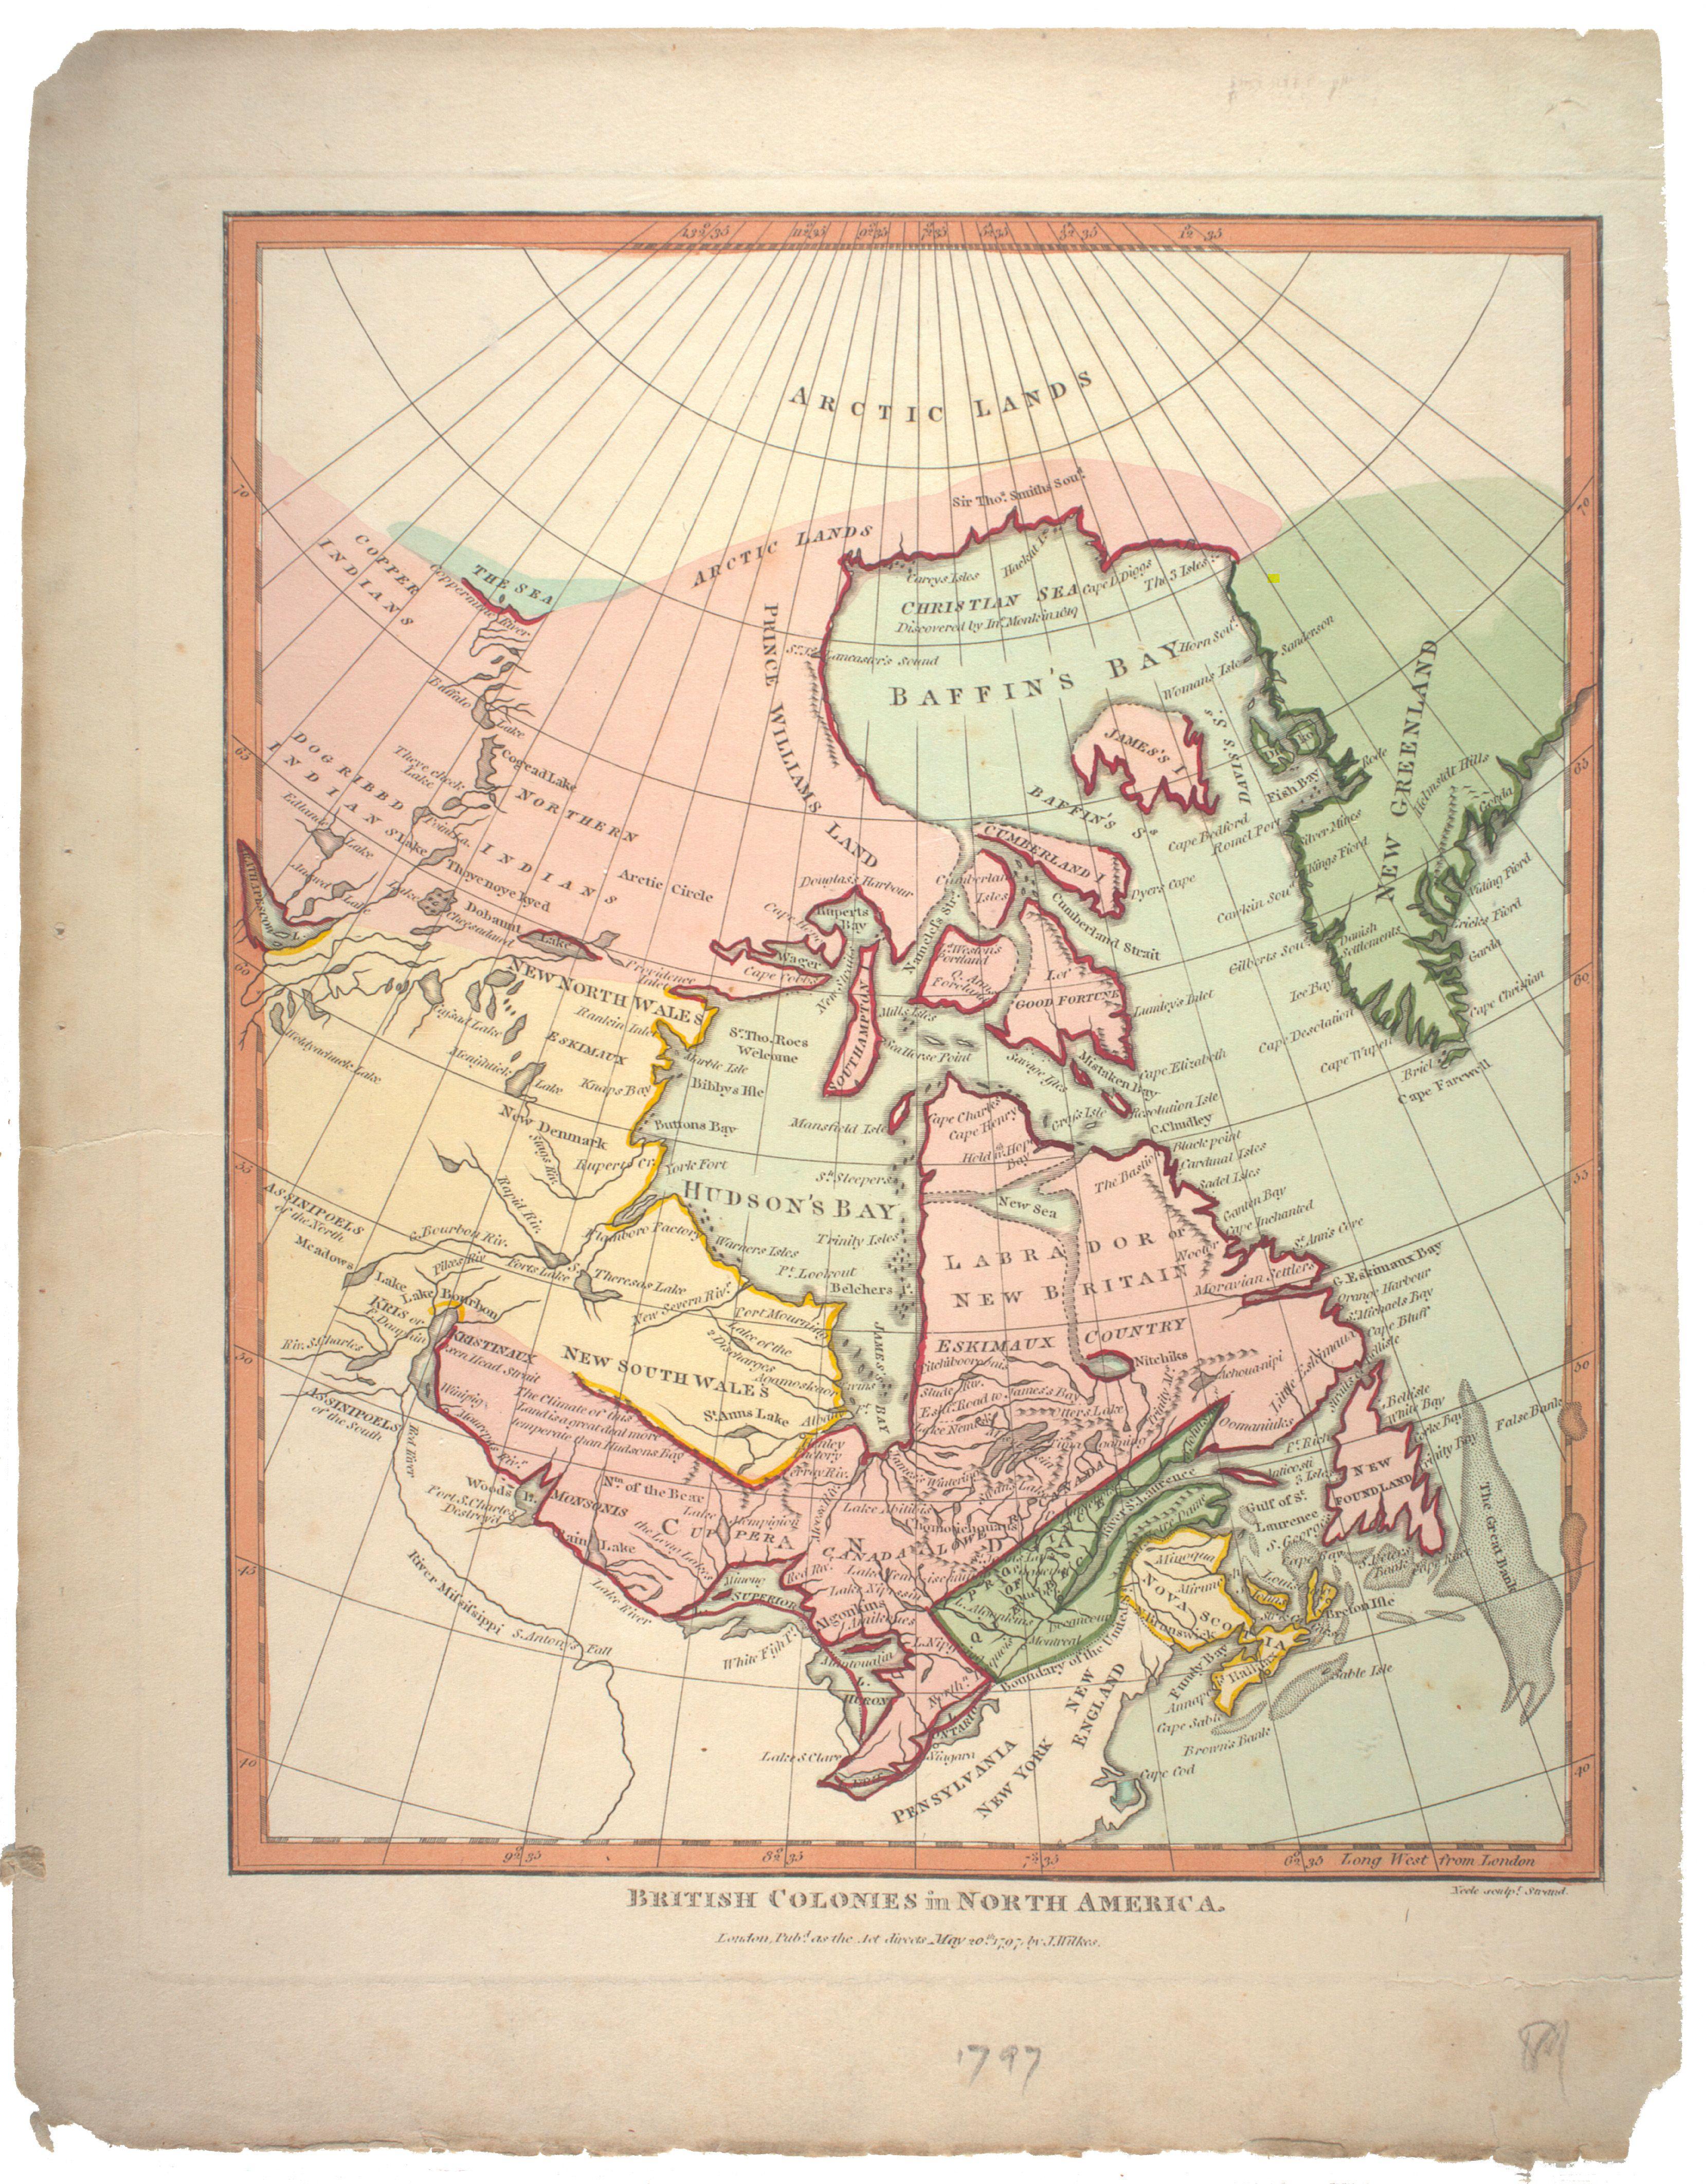 1797 British Colonies in North America / John Wilkes. Scale ...